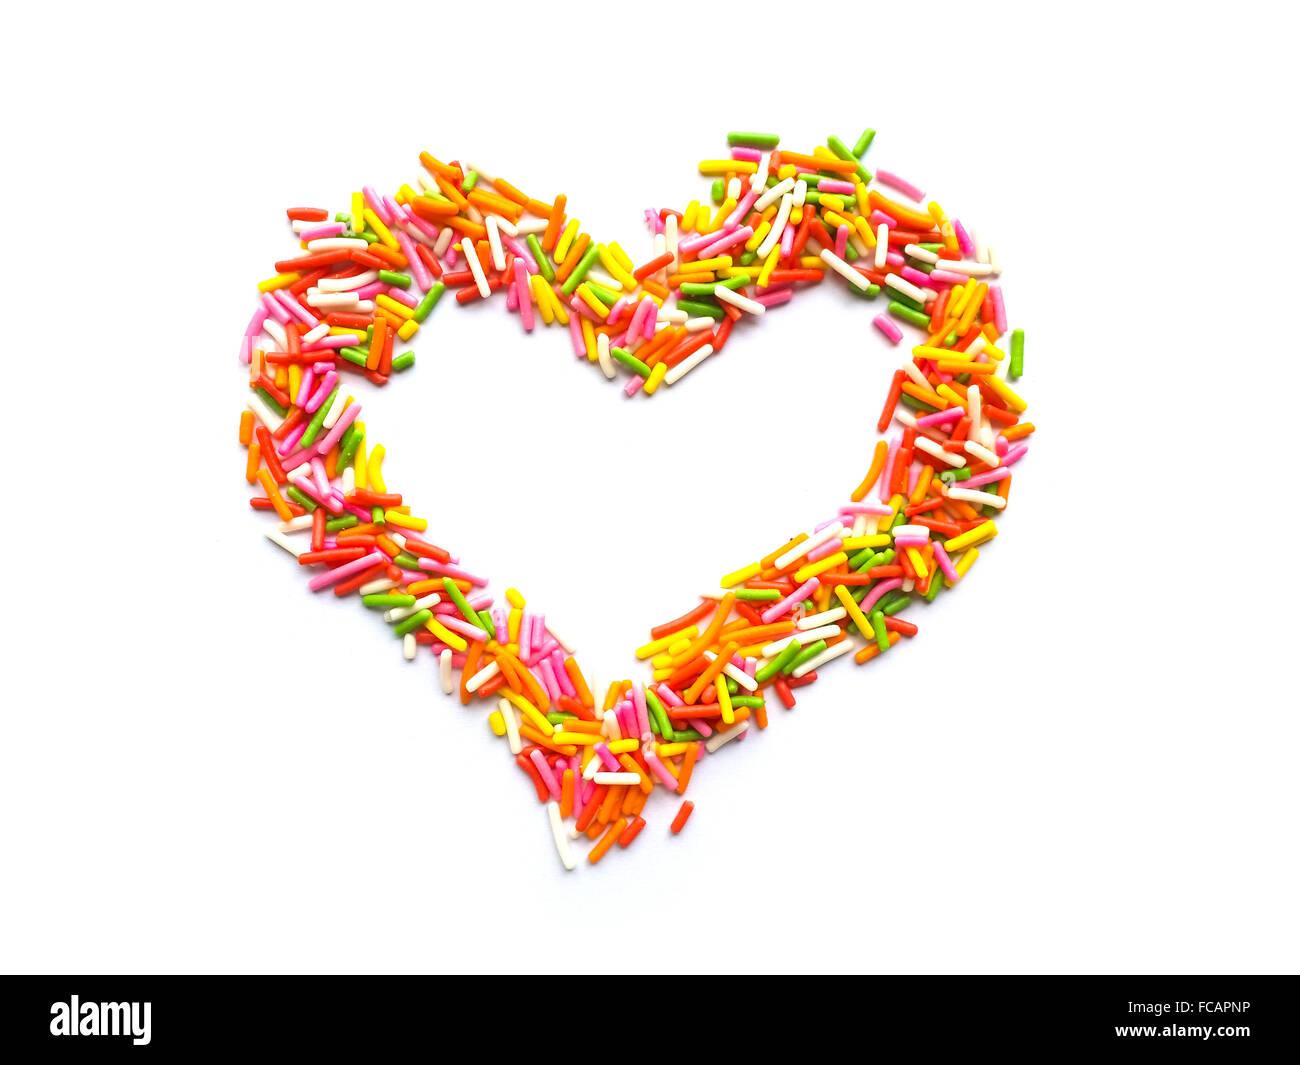 Valentine sweet sprinkle heart on white background - Stock Image